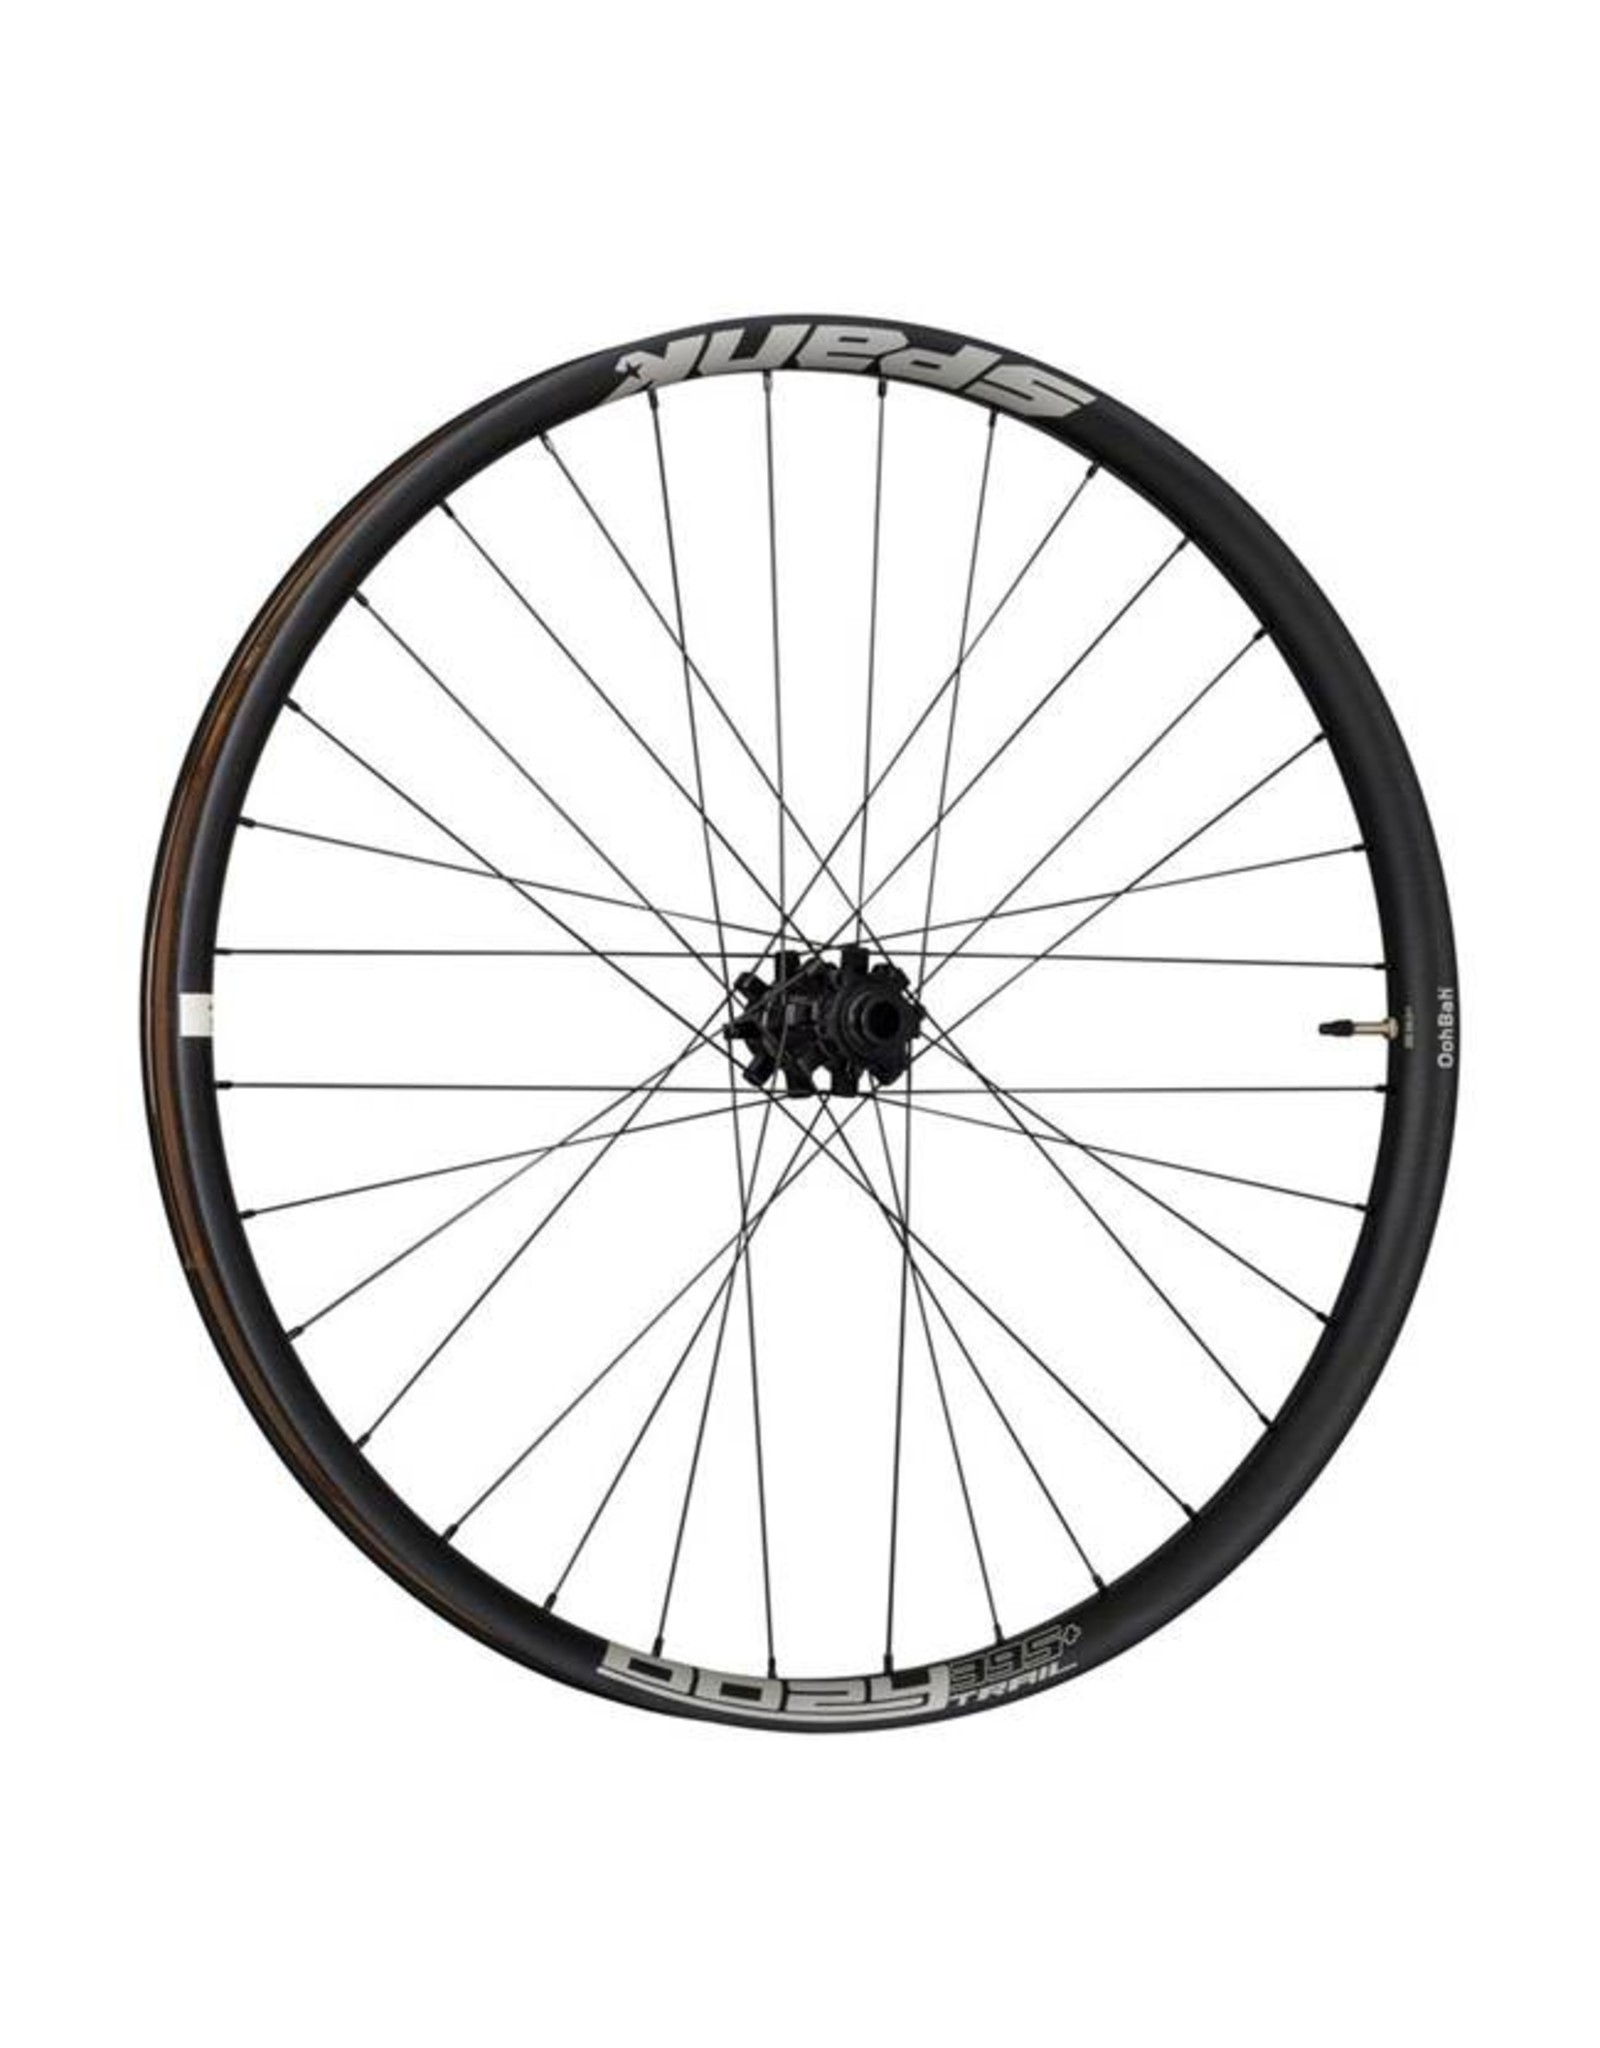 Spank Spank Oozy Trail 345 Wheelset: 27.5+ 15 x 110mm Front 12 x 148mm Rear Shimano 10/11 MTB Freehub Black